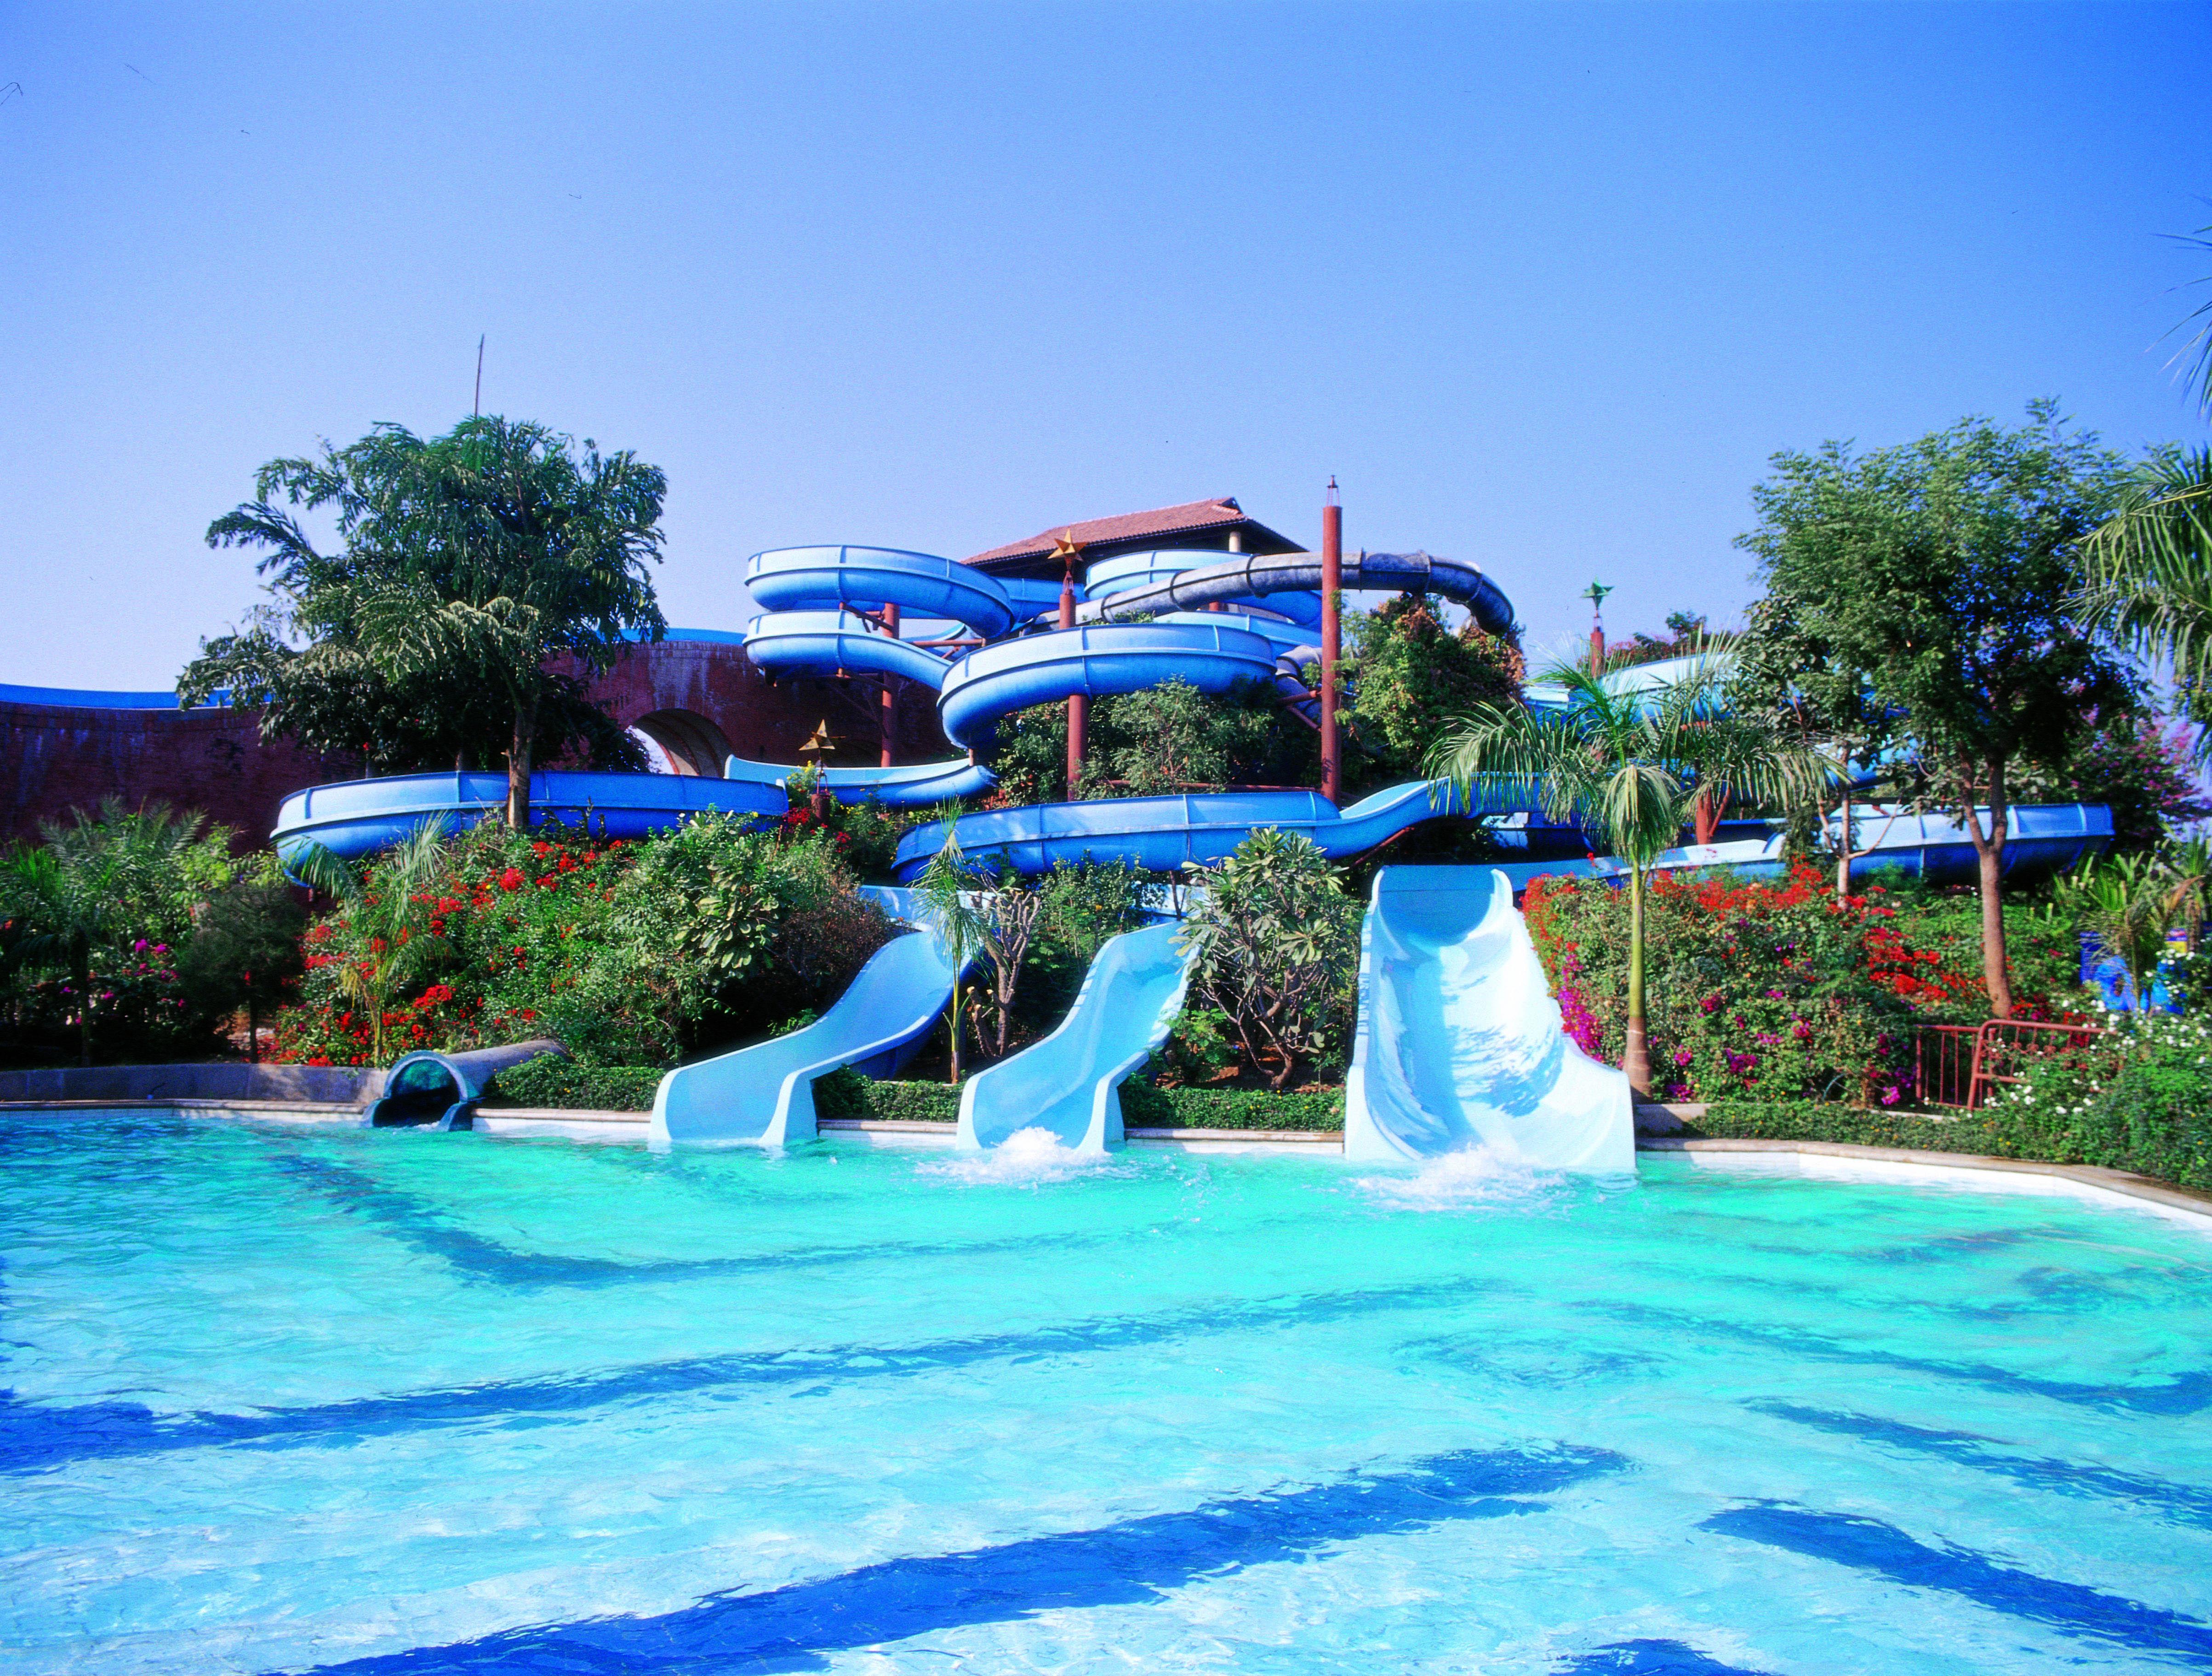 Amusement Large Fun Park Shanku Water Park Consumer Review